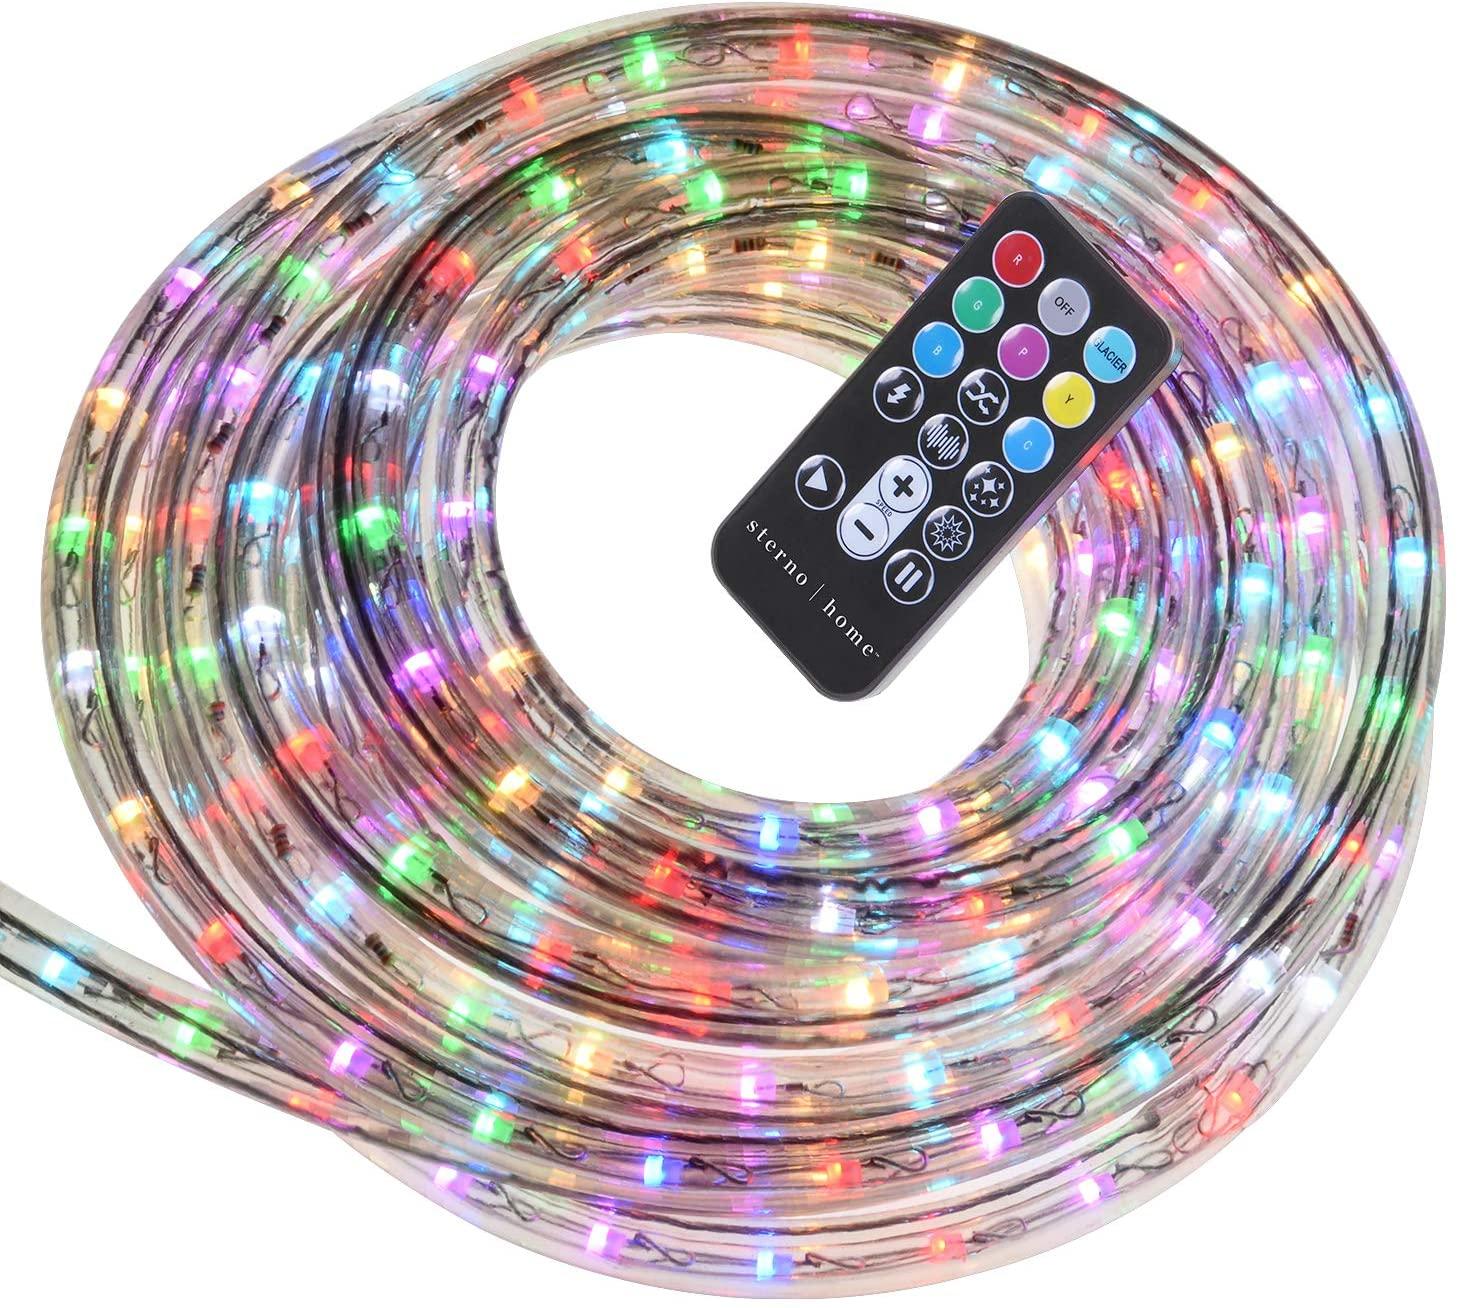 Rope Light For Outdoor 100m Ip65 White Christmas Luminous Led Body Lamp Pvc Pse Power Item Warm